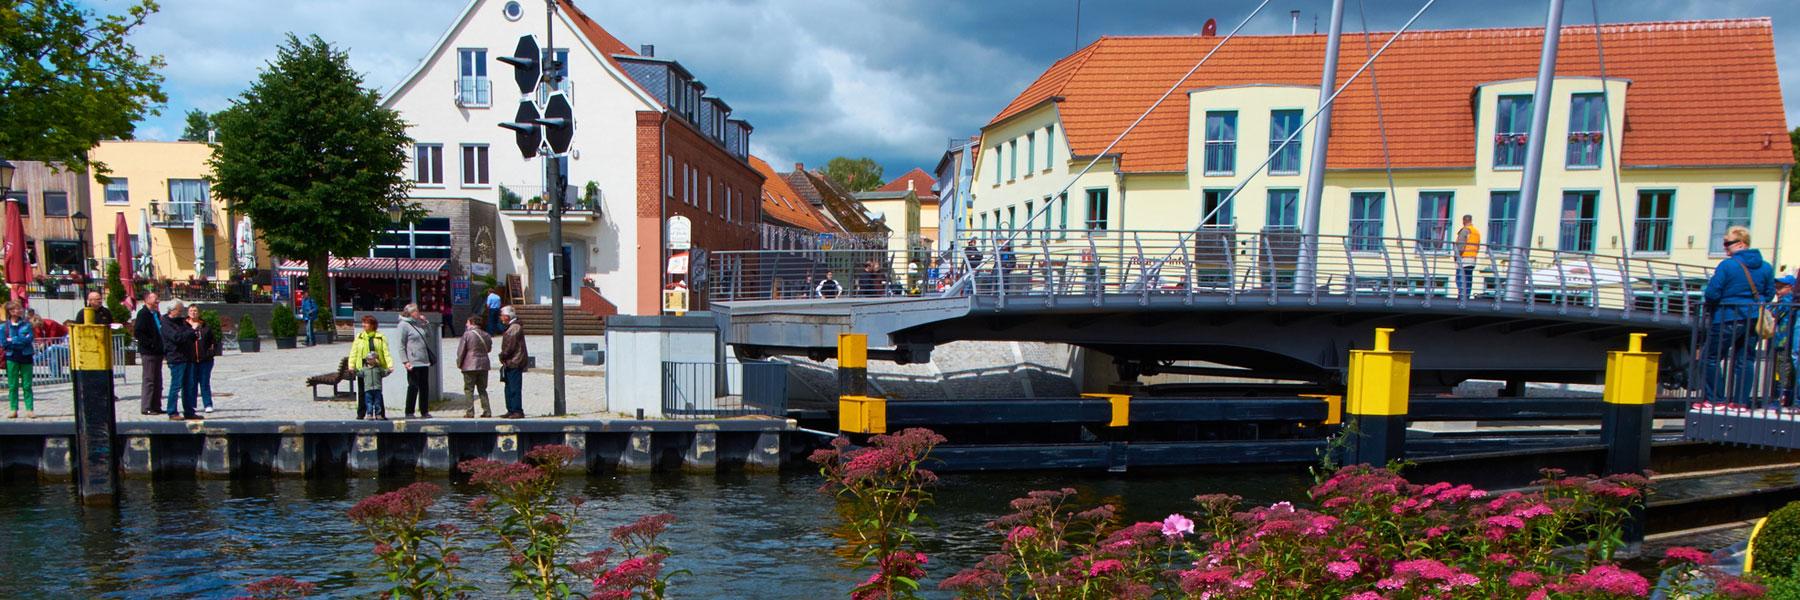 Stadt - Stadt Malchow